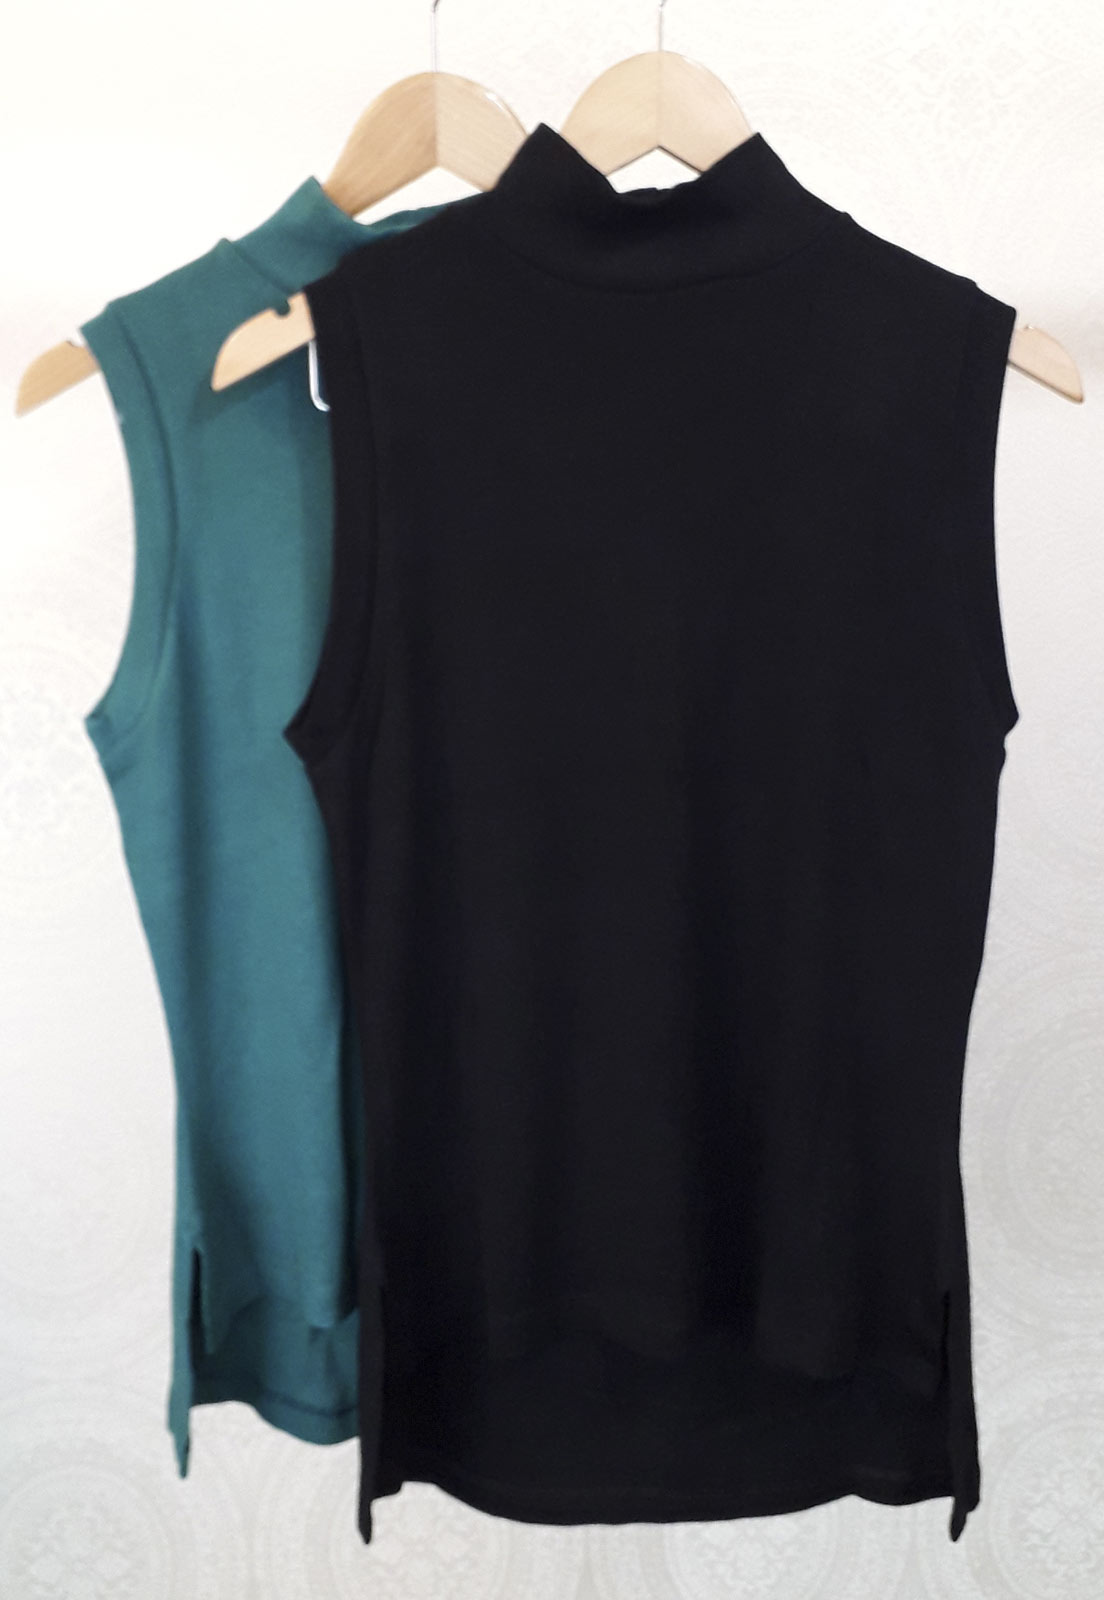 Kit c/ 2 T-shirts Helô - Preta e Verde